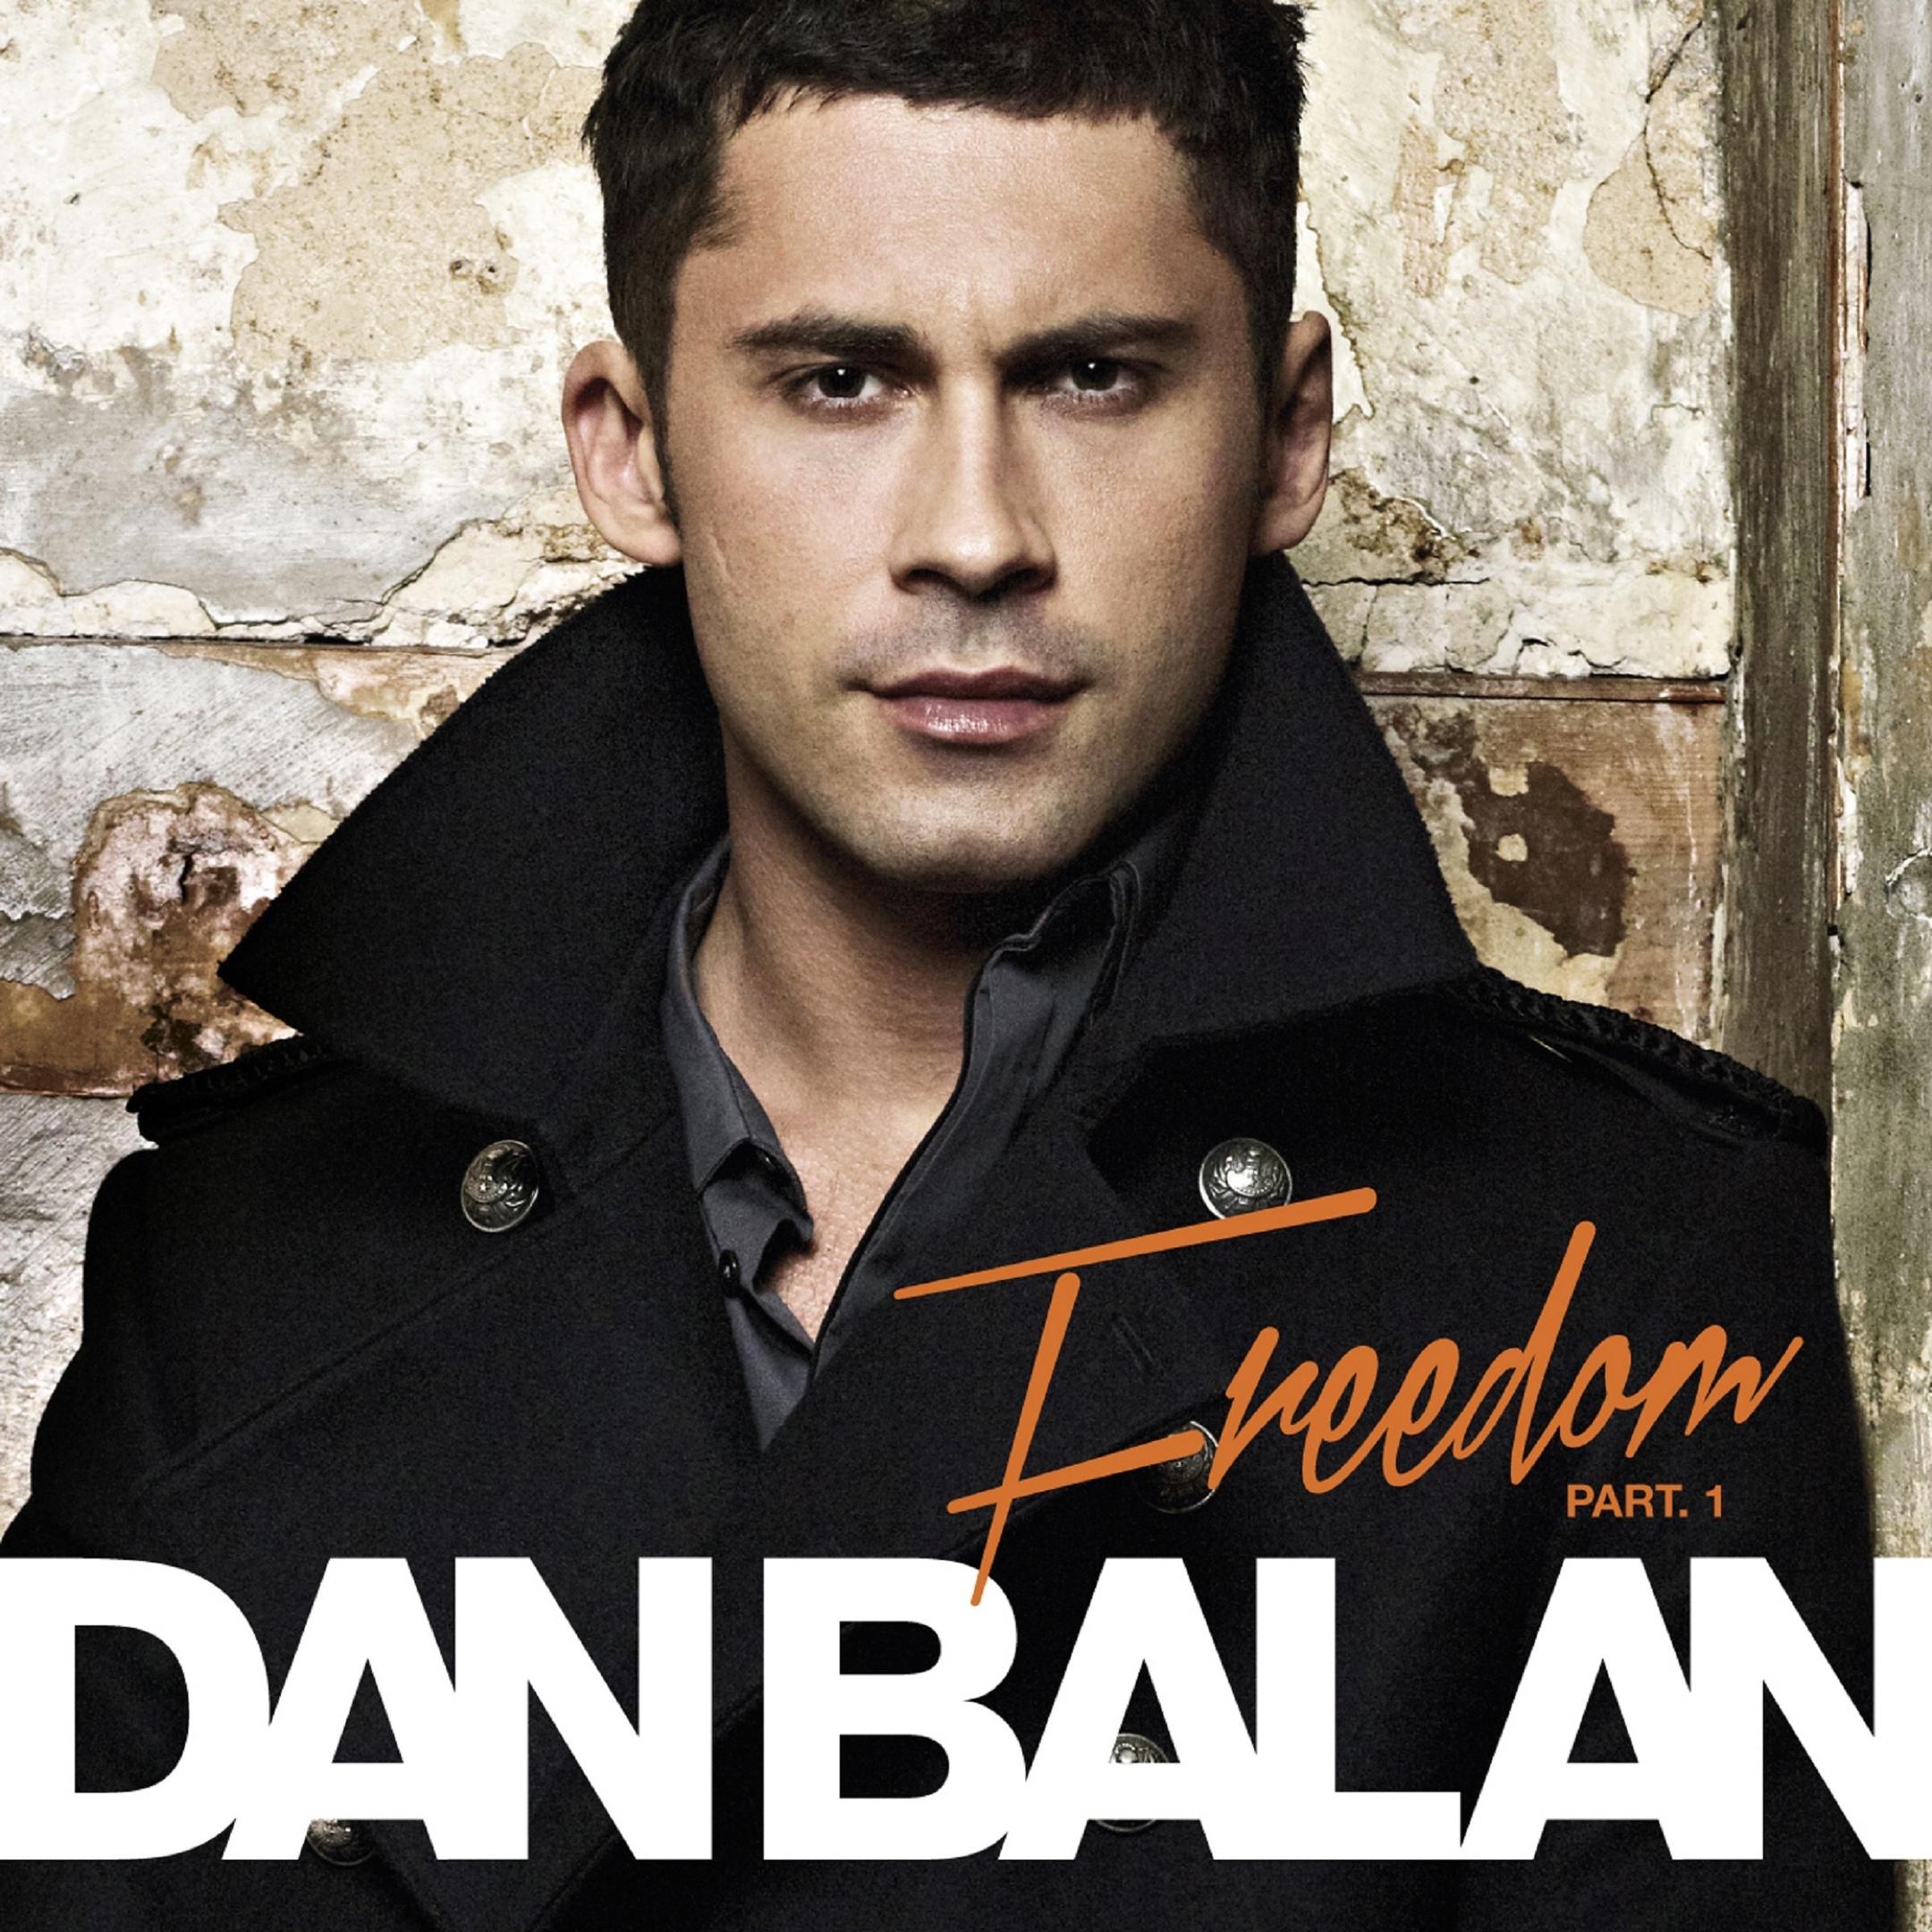 Dan Balan album Freedom, Pt. 1